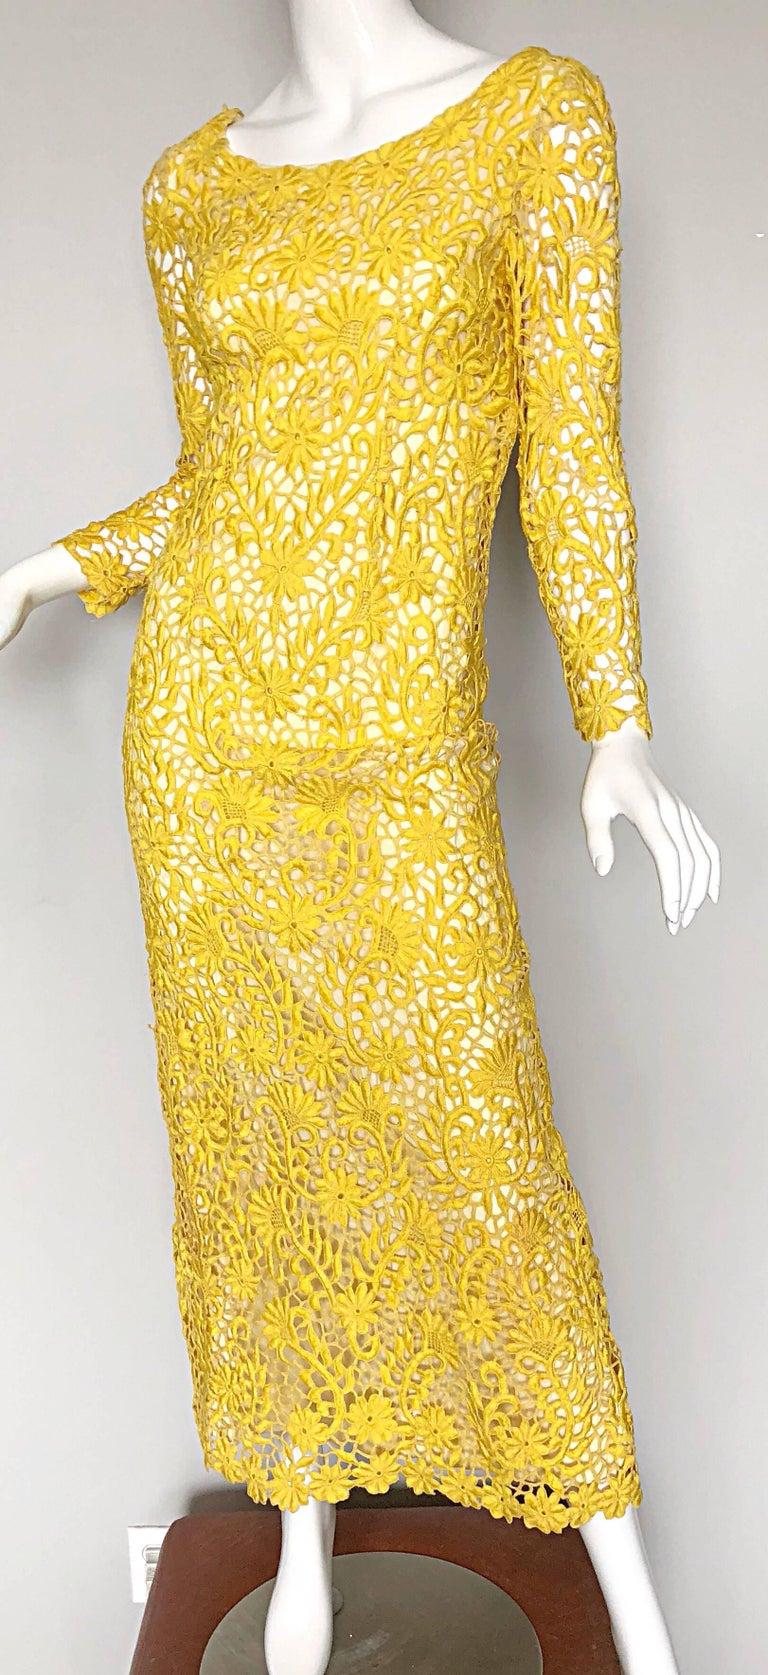 8634c474c7f Women s Joe Salazar Rare 1960s Canary Yellow Hand Crochet Vintage 60s Maxi Dress  Gown For Sale